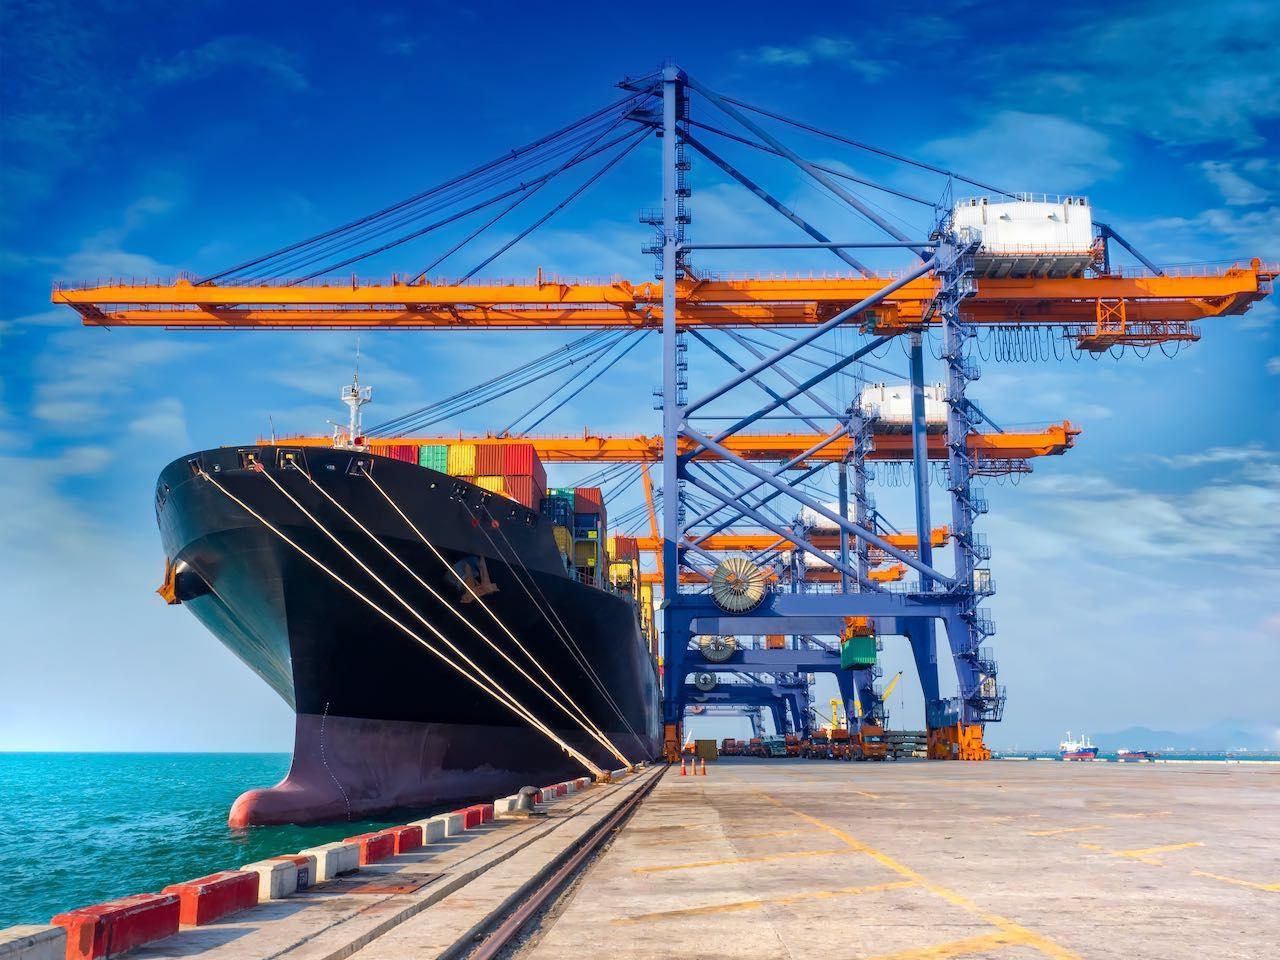 Zunehmend beliebt an der Fondsbörse: Containerschiffs wie dieses